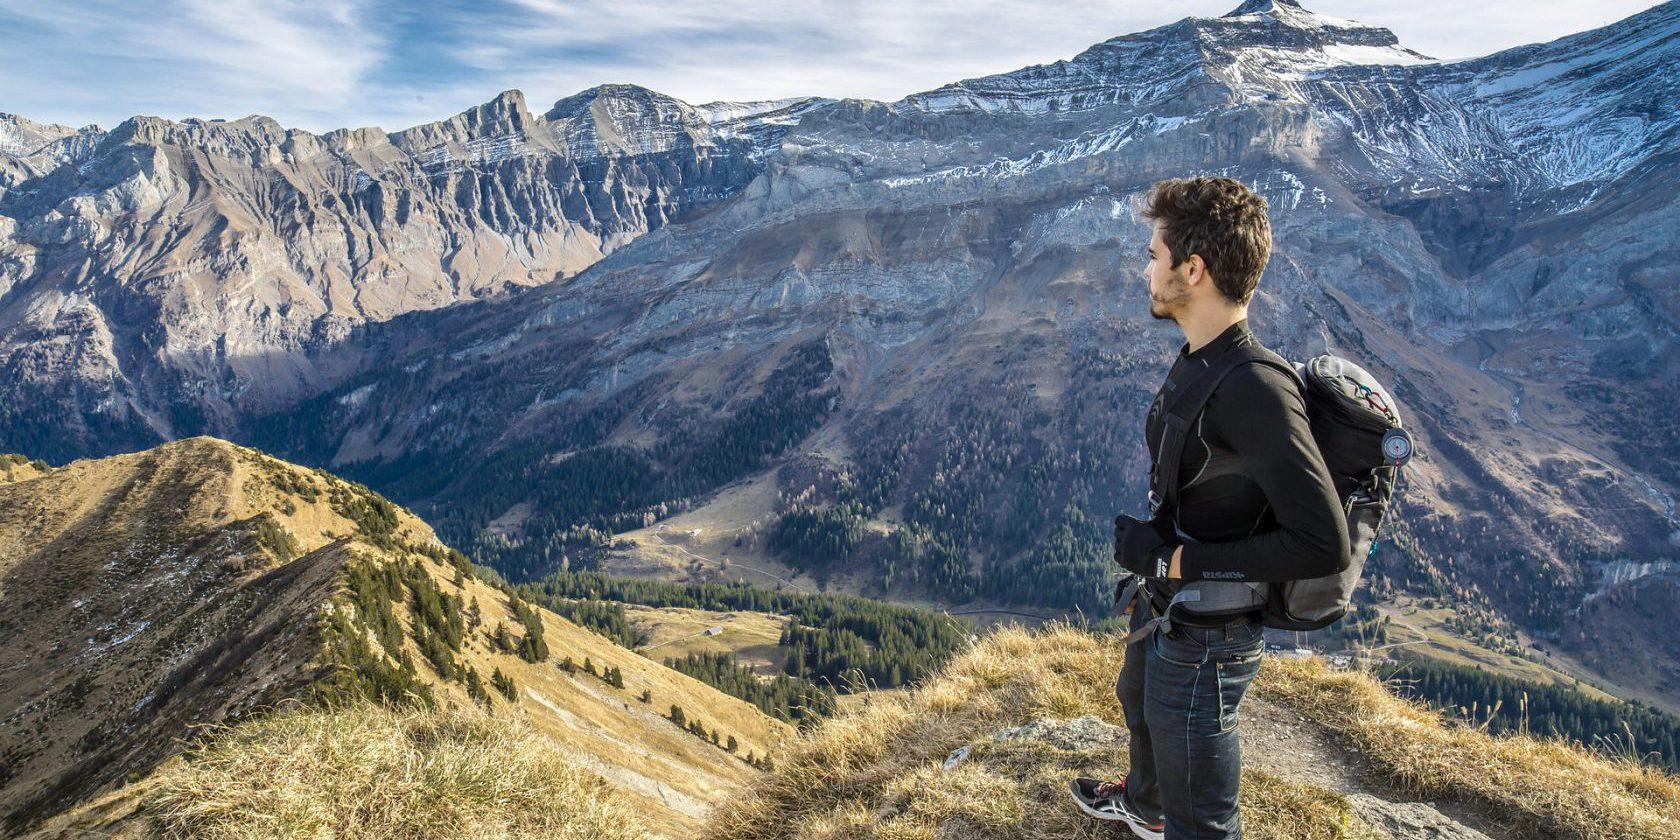 Man standing on mountain, doing international work experience